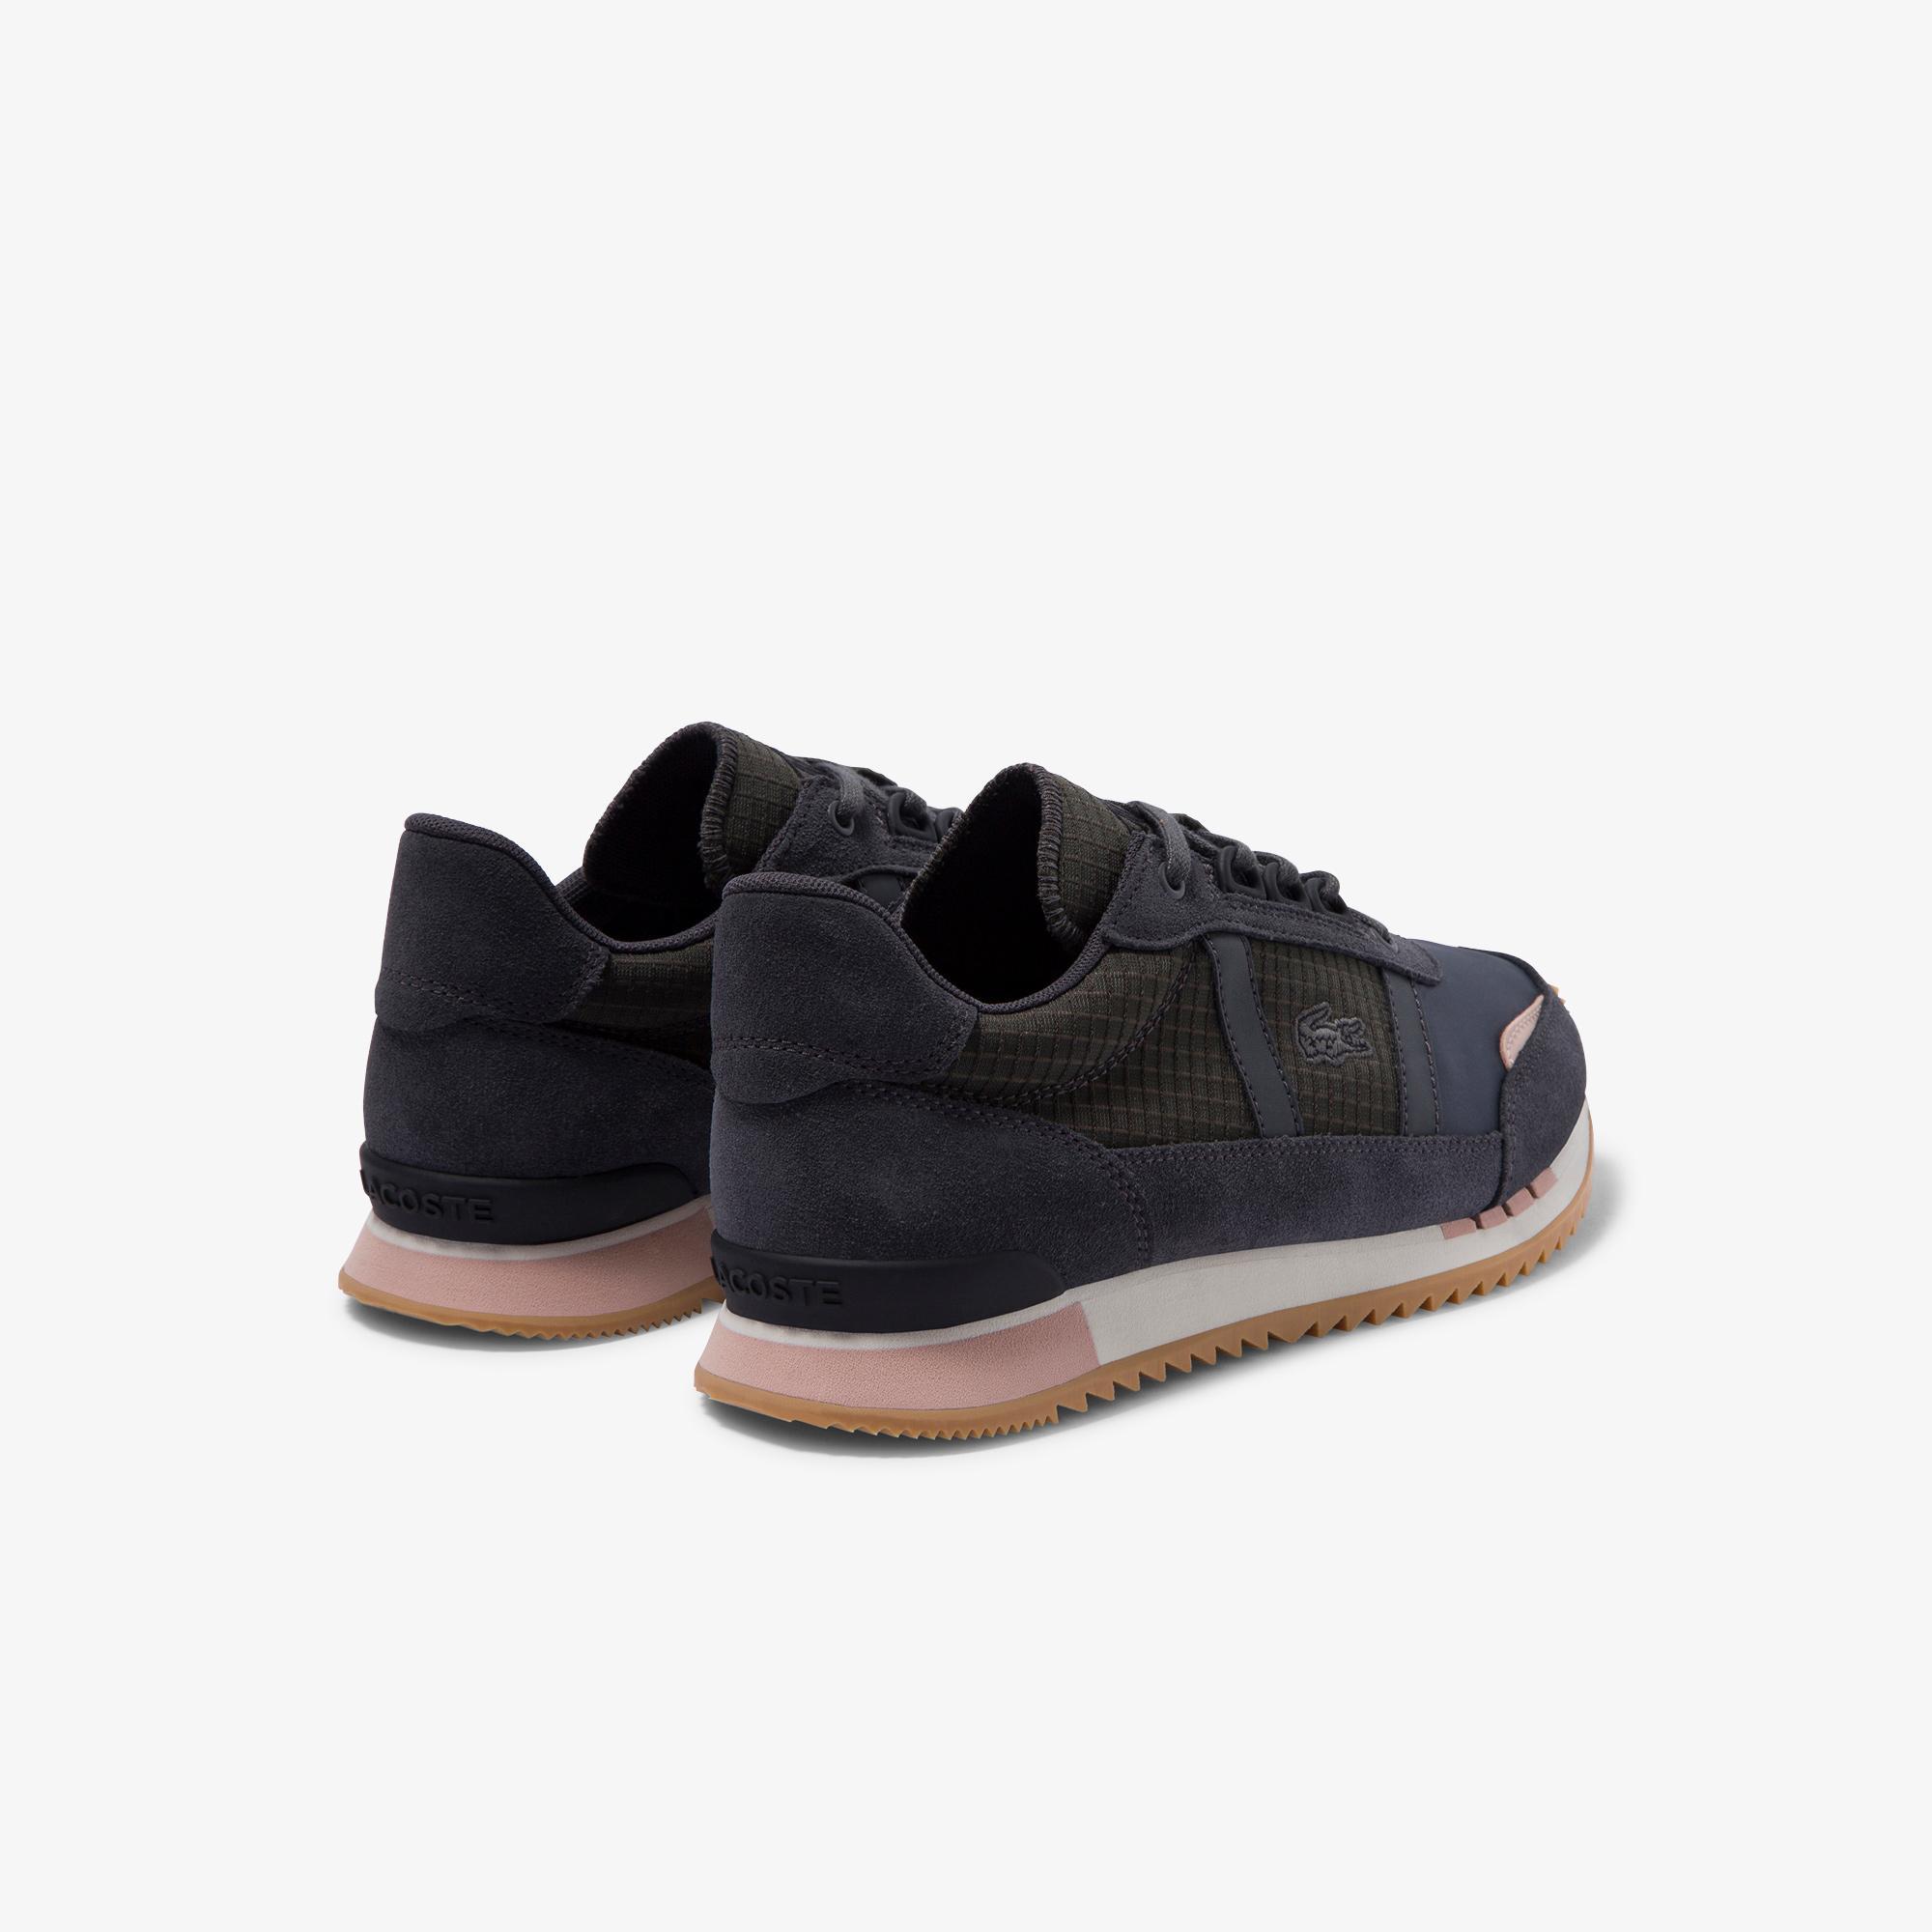 Lacoste Partner Retro 120 2 Sfa Kadın Koyu Gri - Pudra Sneaker